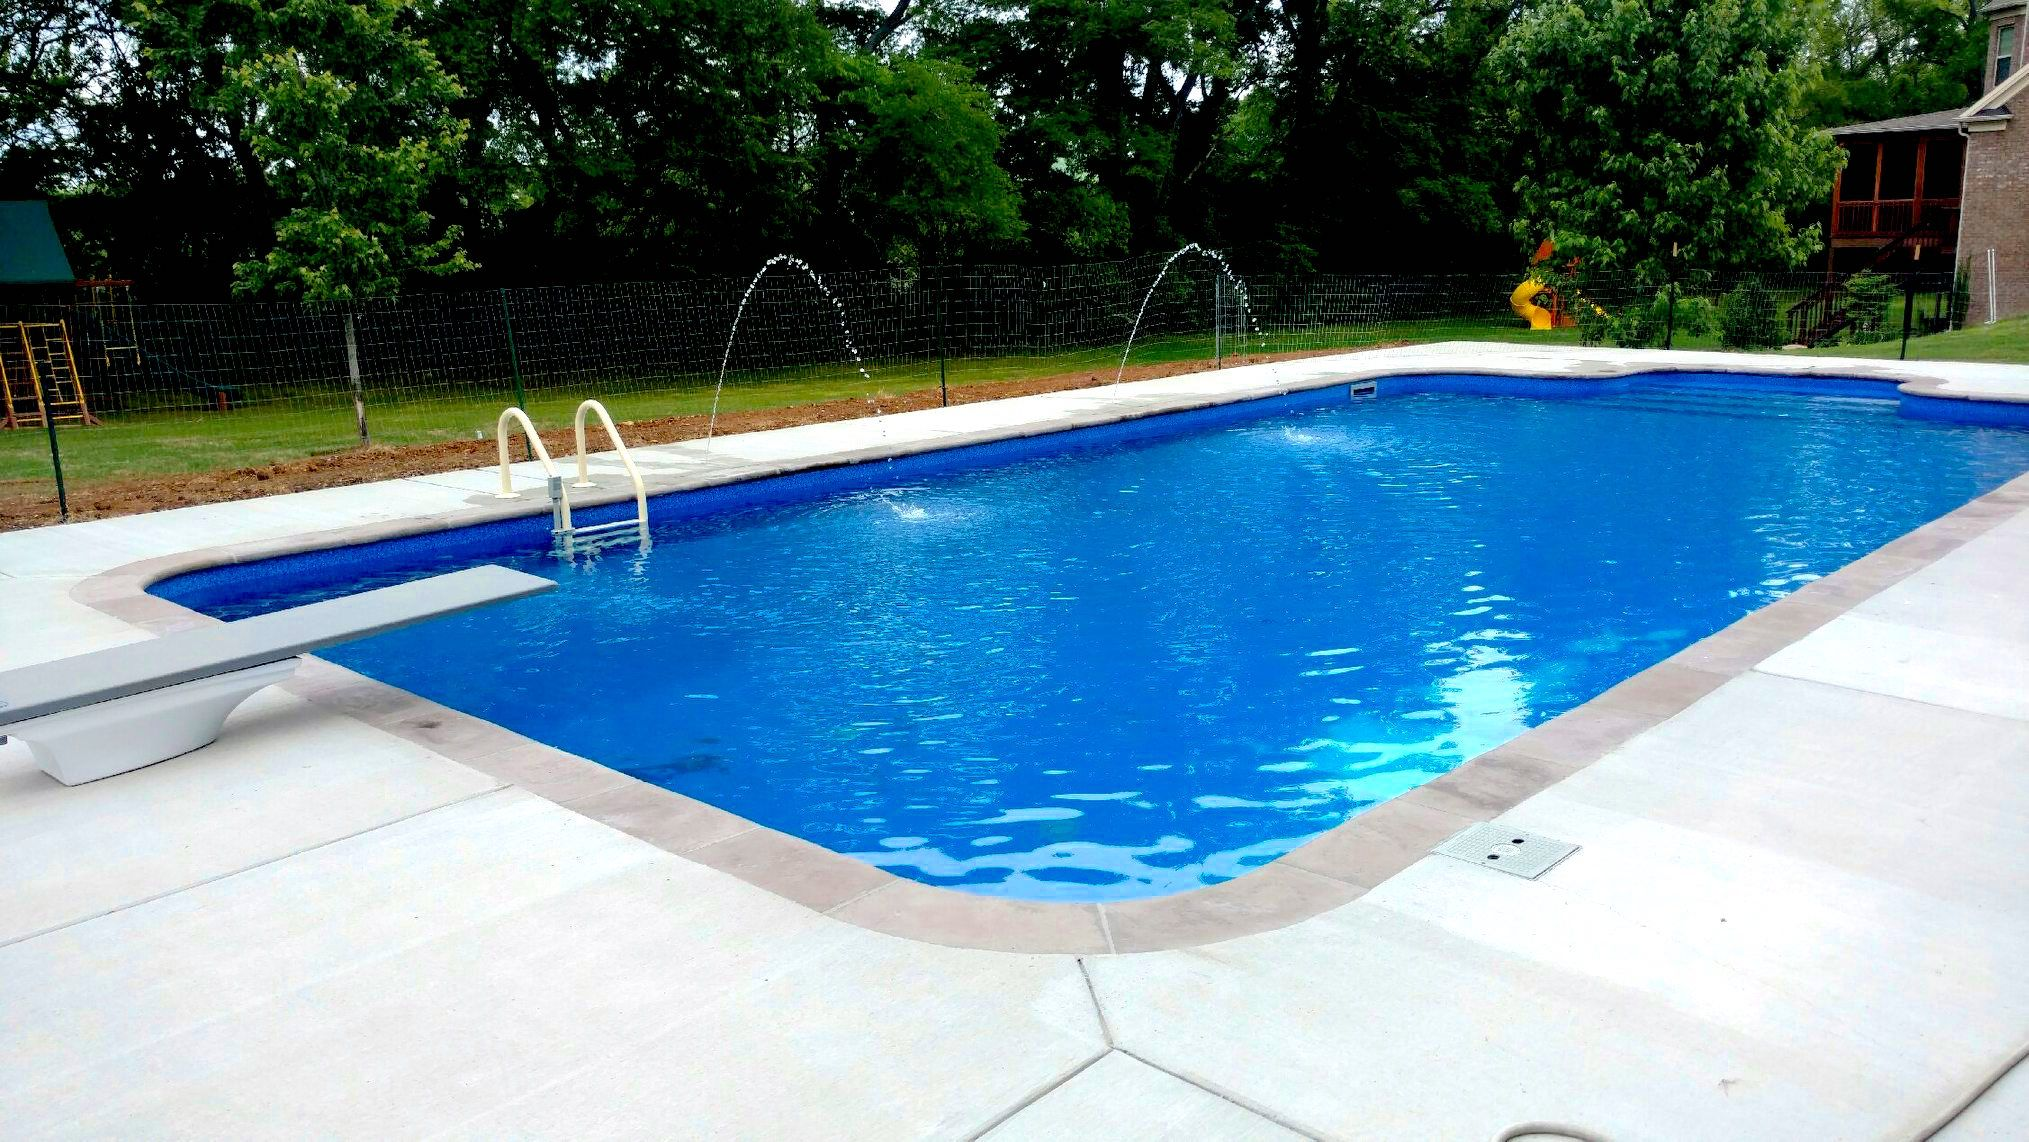 Pool And Spa Depot 20 X 40 Concrete Wall Pool Rectangle Shape Bluestone Liner Pattern Mocha Wet Cast Coping Broom Fin Spa Pool Rectangle Pool Concrete Wall